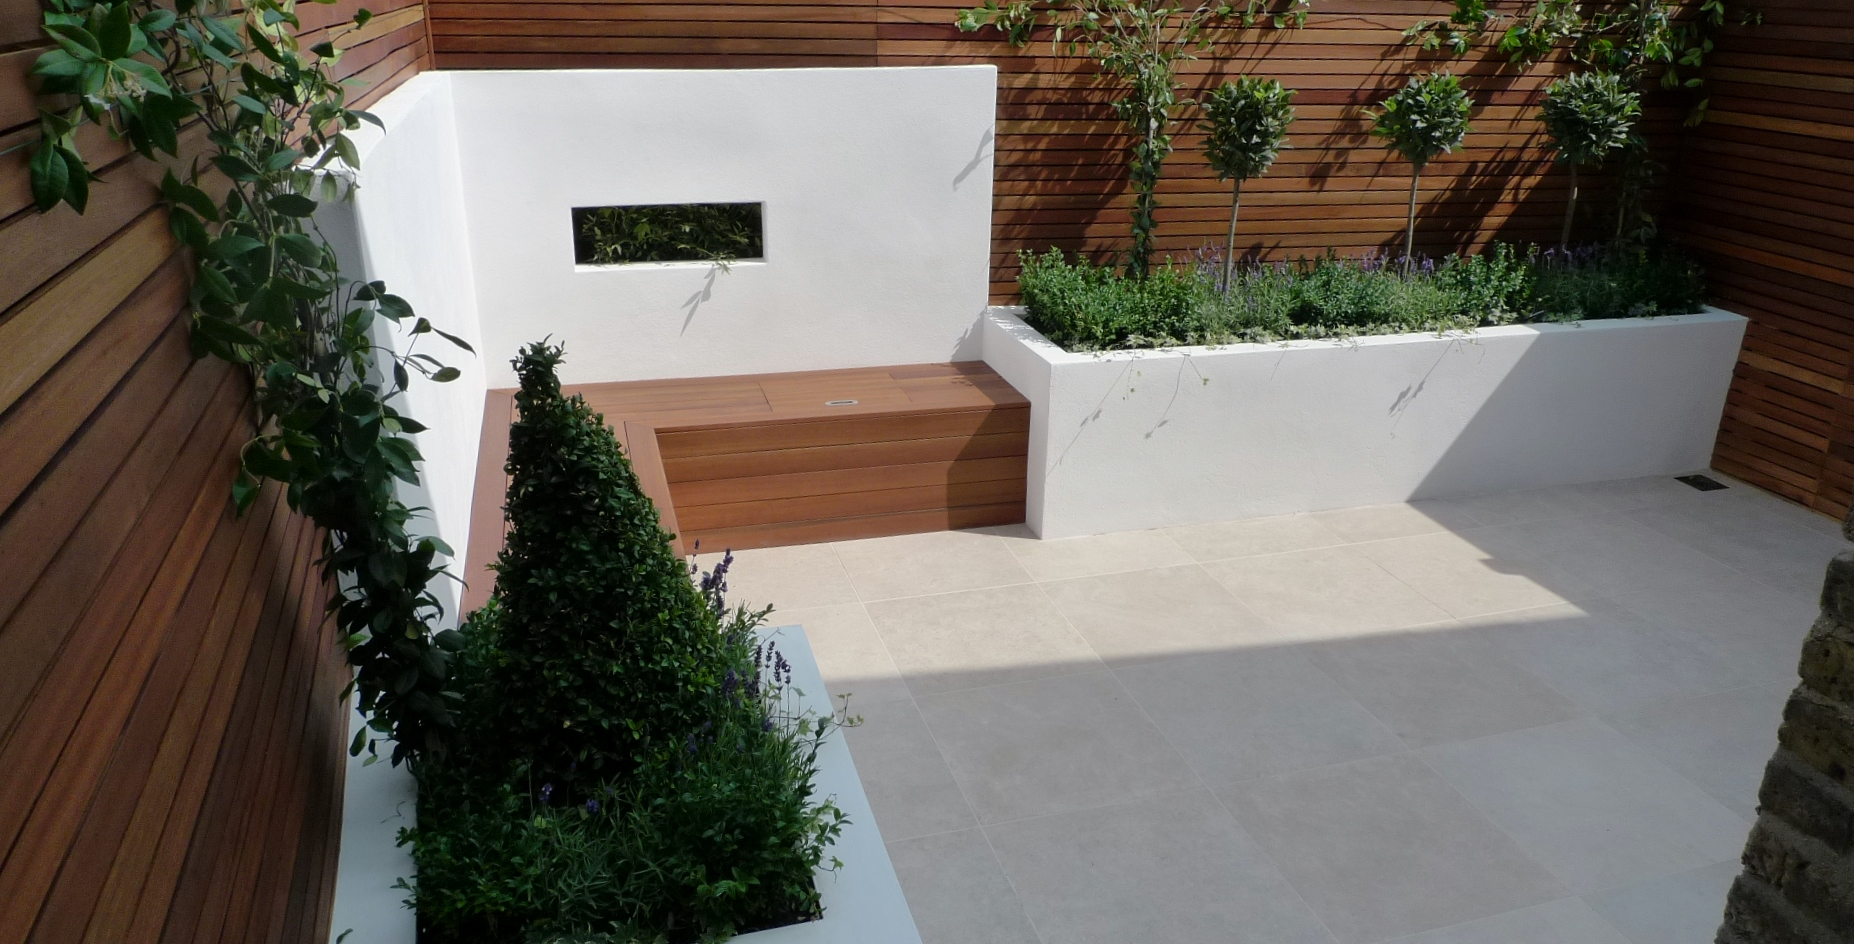 Landscaping archives london garden blog for Paving ideas for small gardens